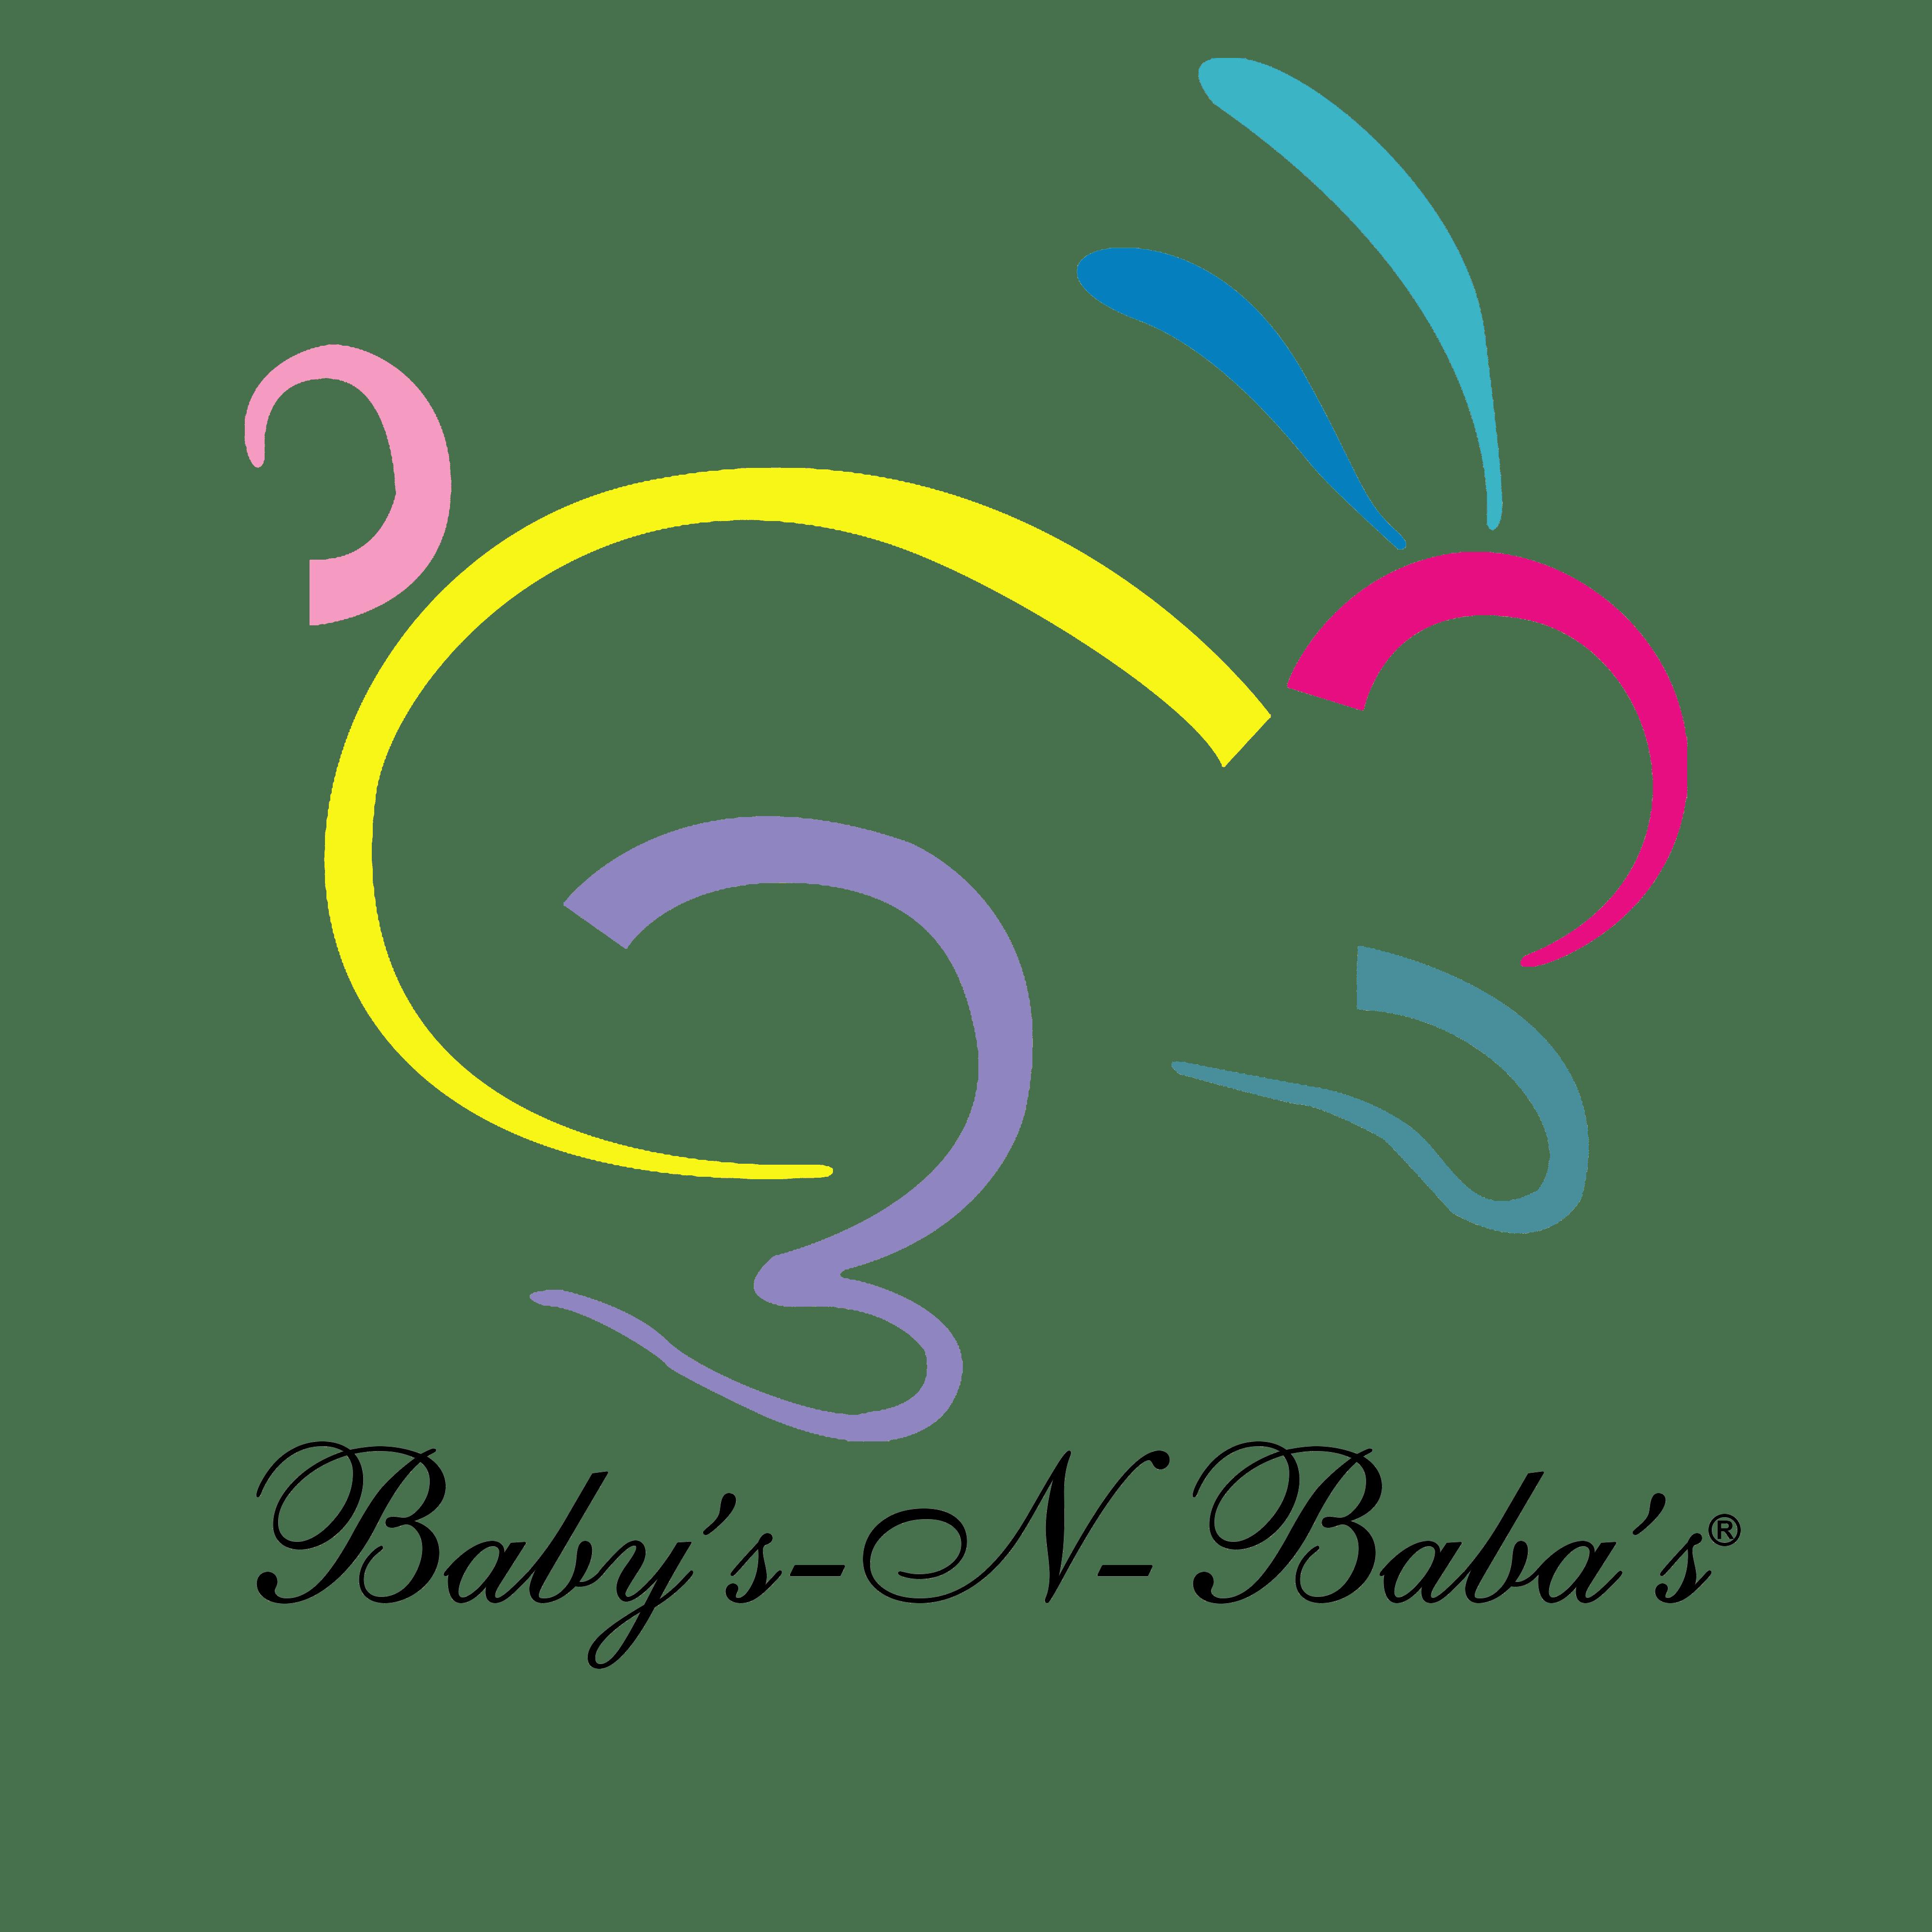 Baby's-N-Baba's